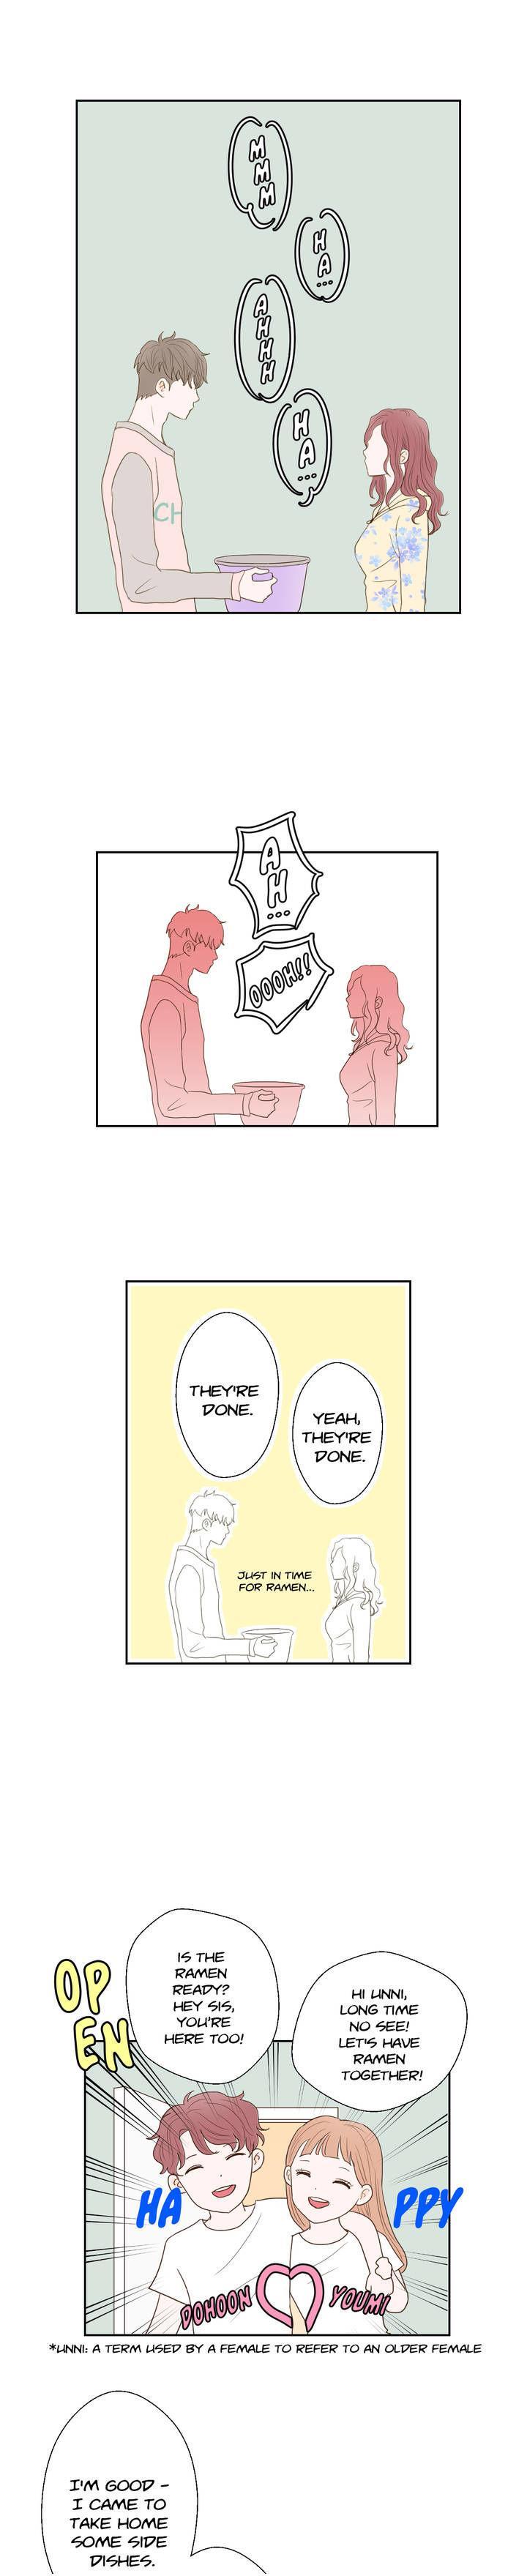 Honey Bed Talk - Chapter 2